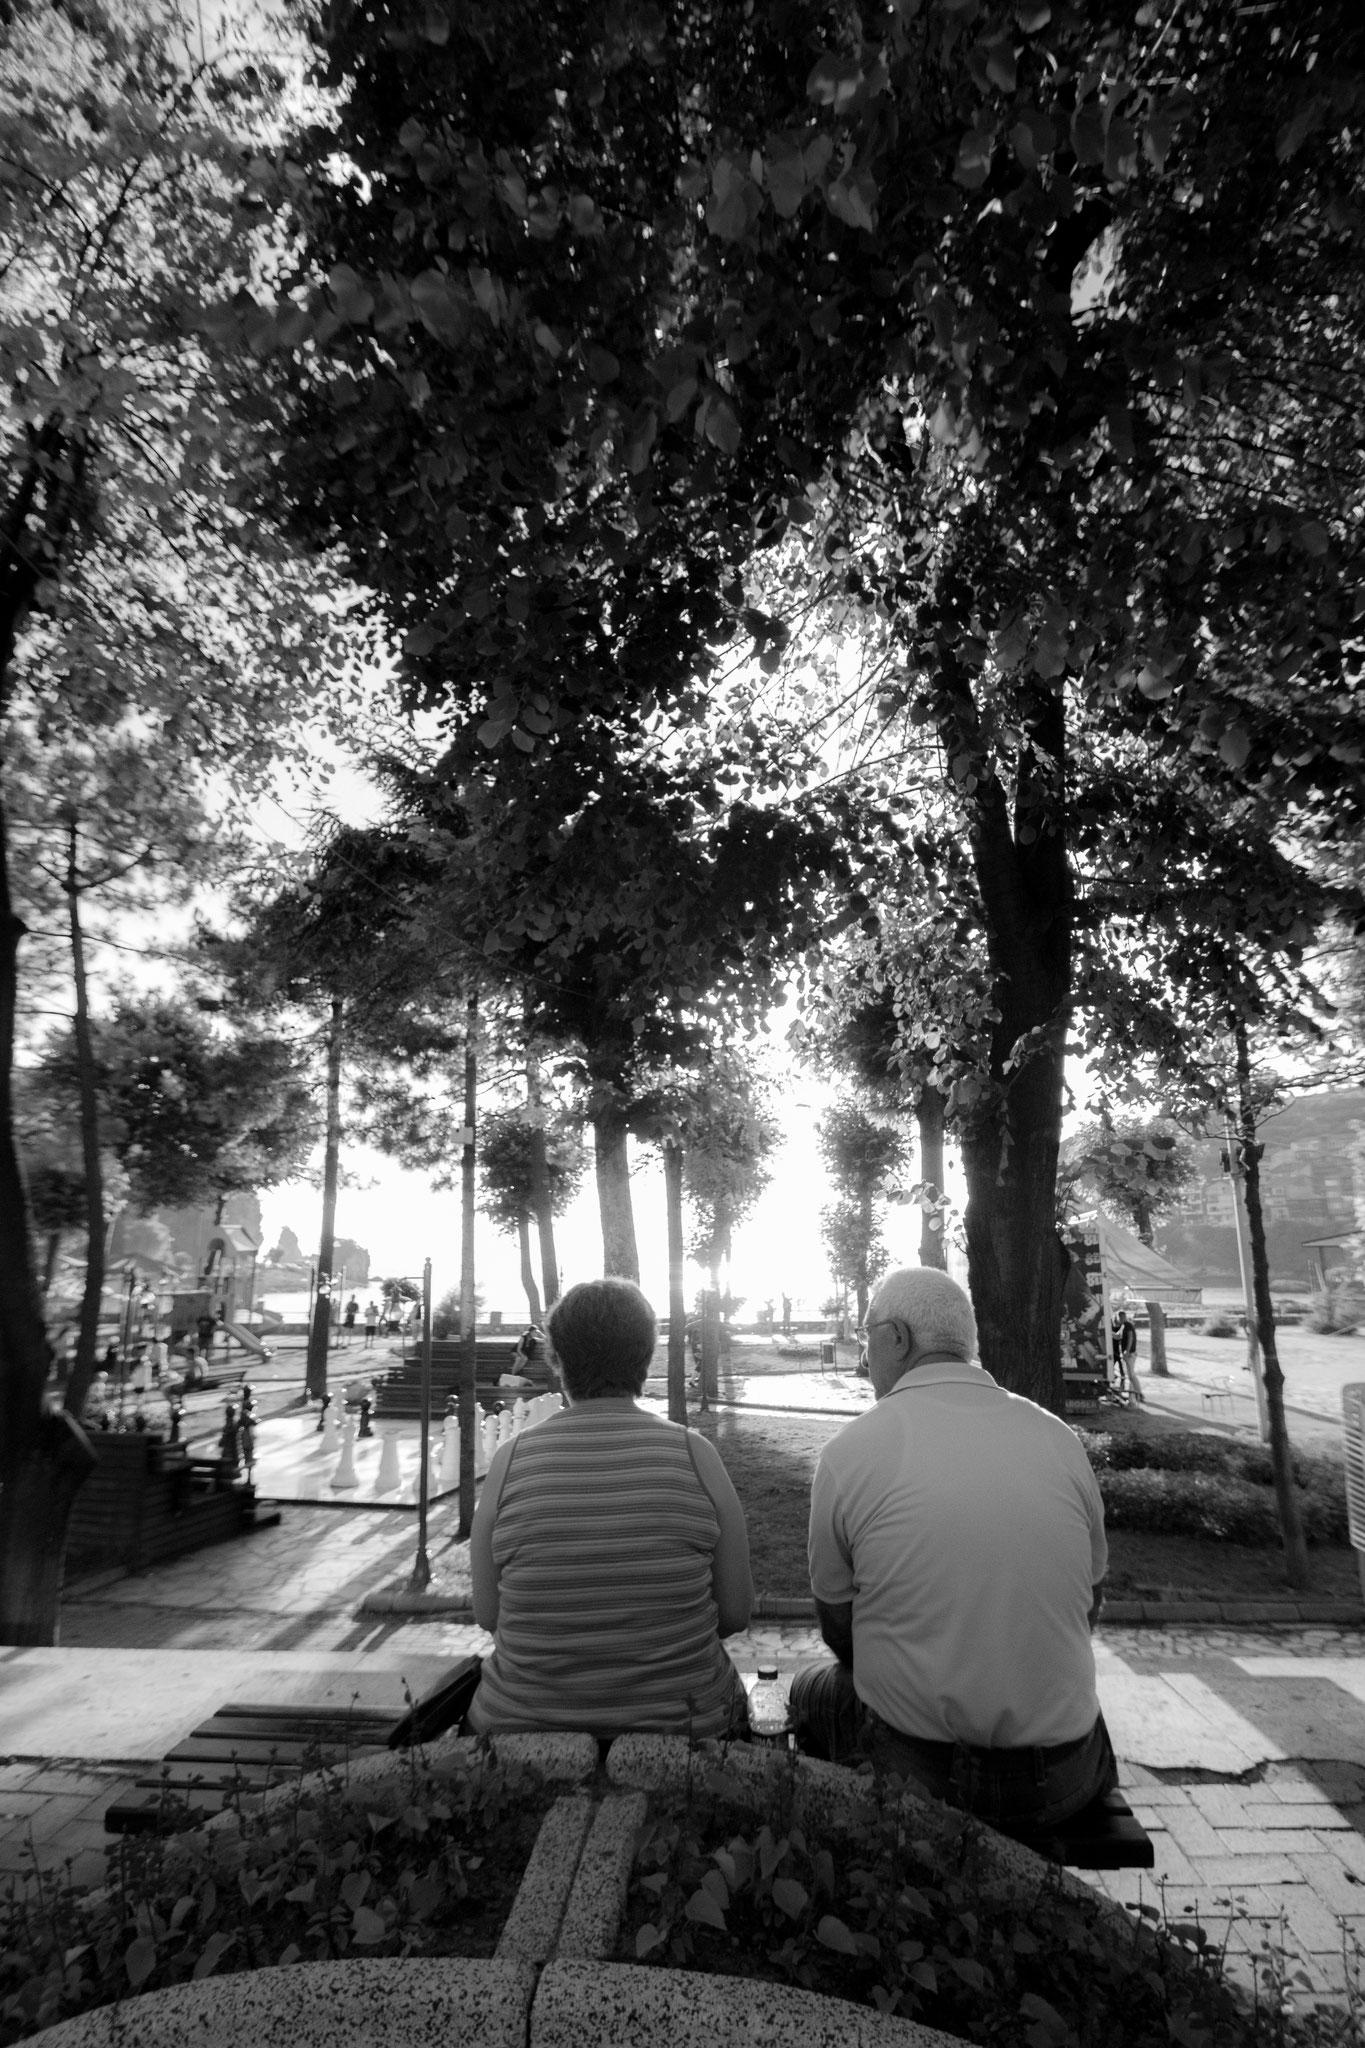 Amasra, Turkey. July 2016.